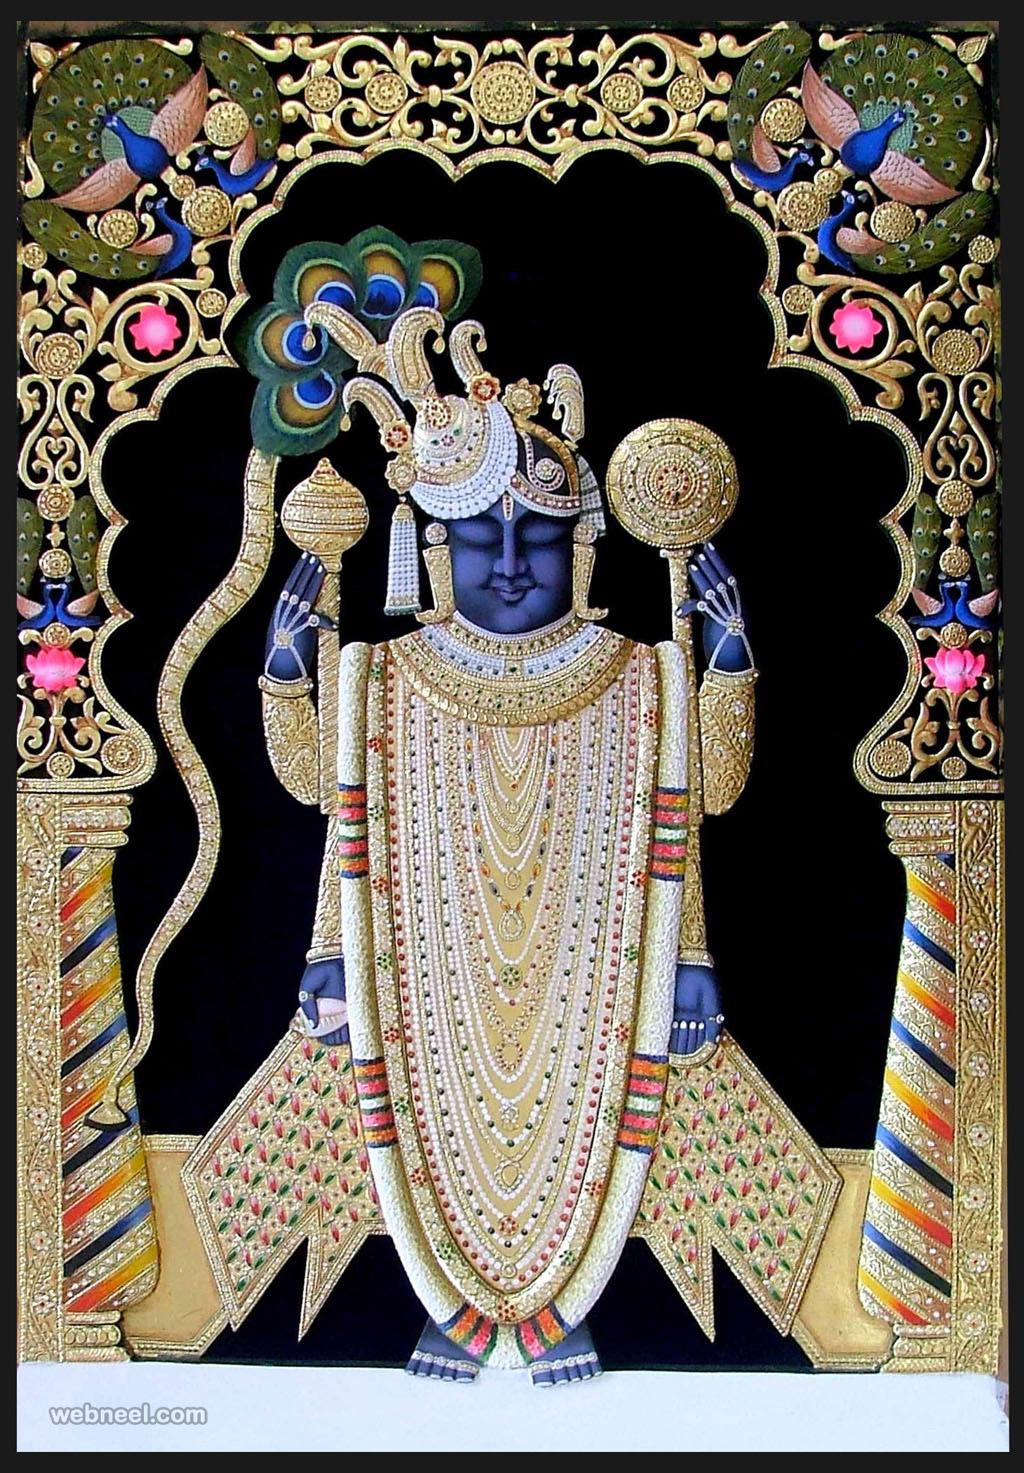 3d Wallpaper For Home Wall India Tanjore Painting Guruvayur Krishna 6